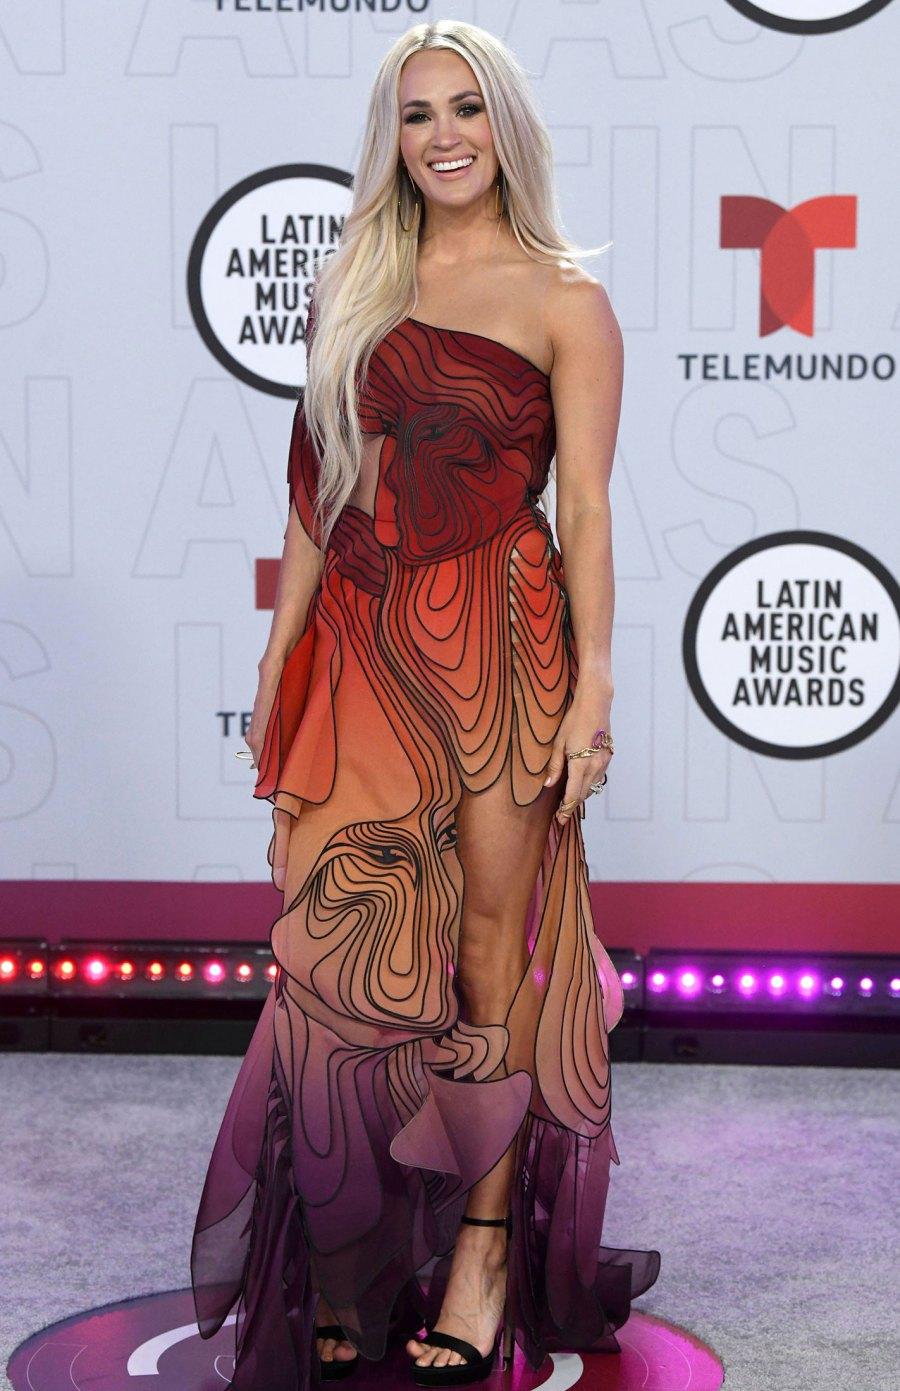 Carrie Underwood April 15, 2021